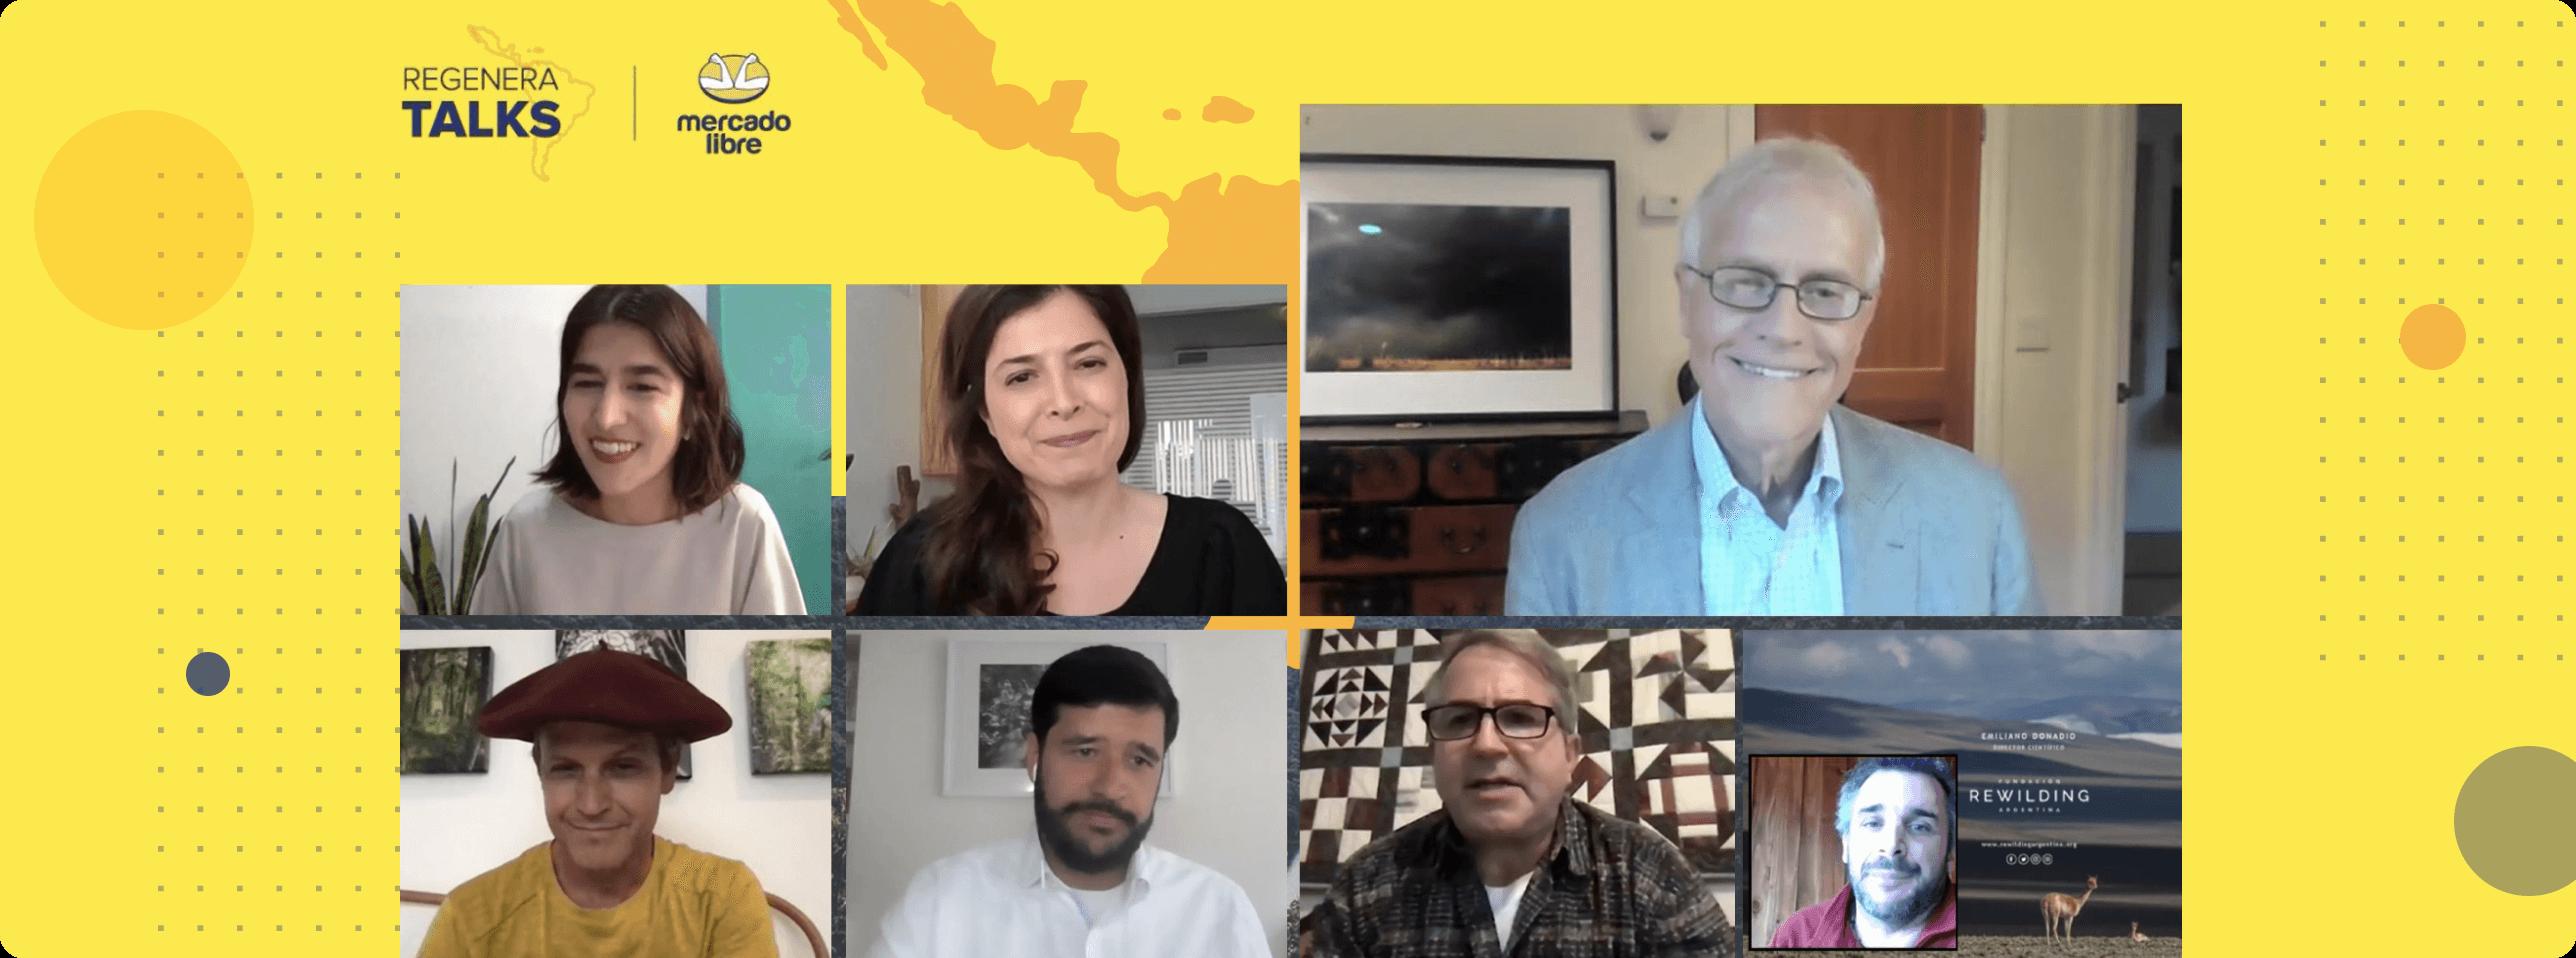 Regenera Talks Mercado Livre